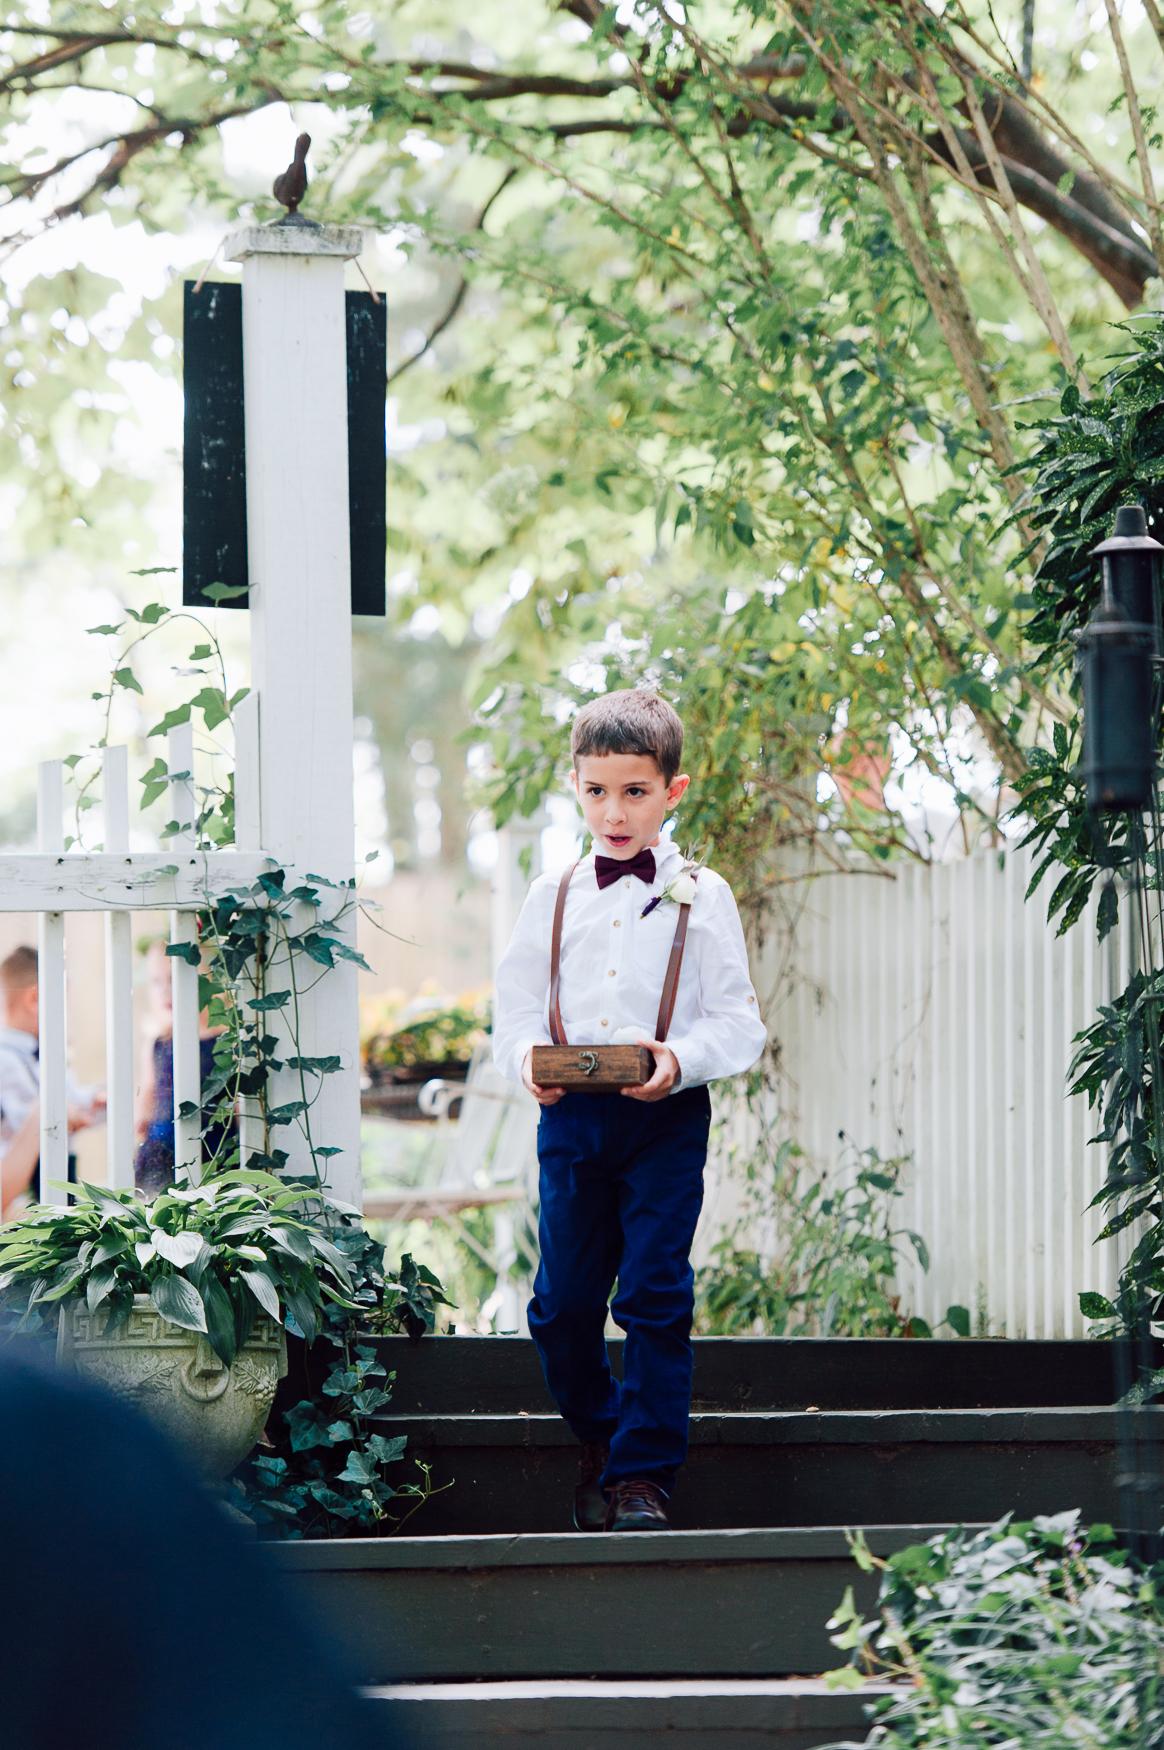 virginiawedding_GlenGarden_rusticwedding_fredericksburg_youseephotography_KellySteven (25).jpg